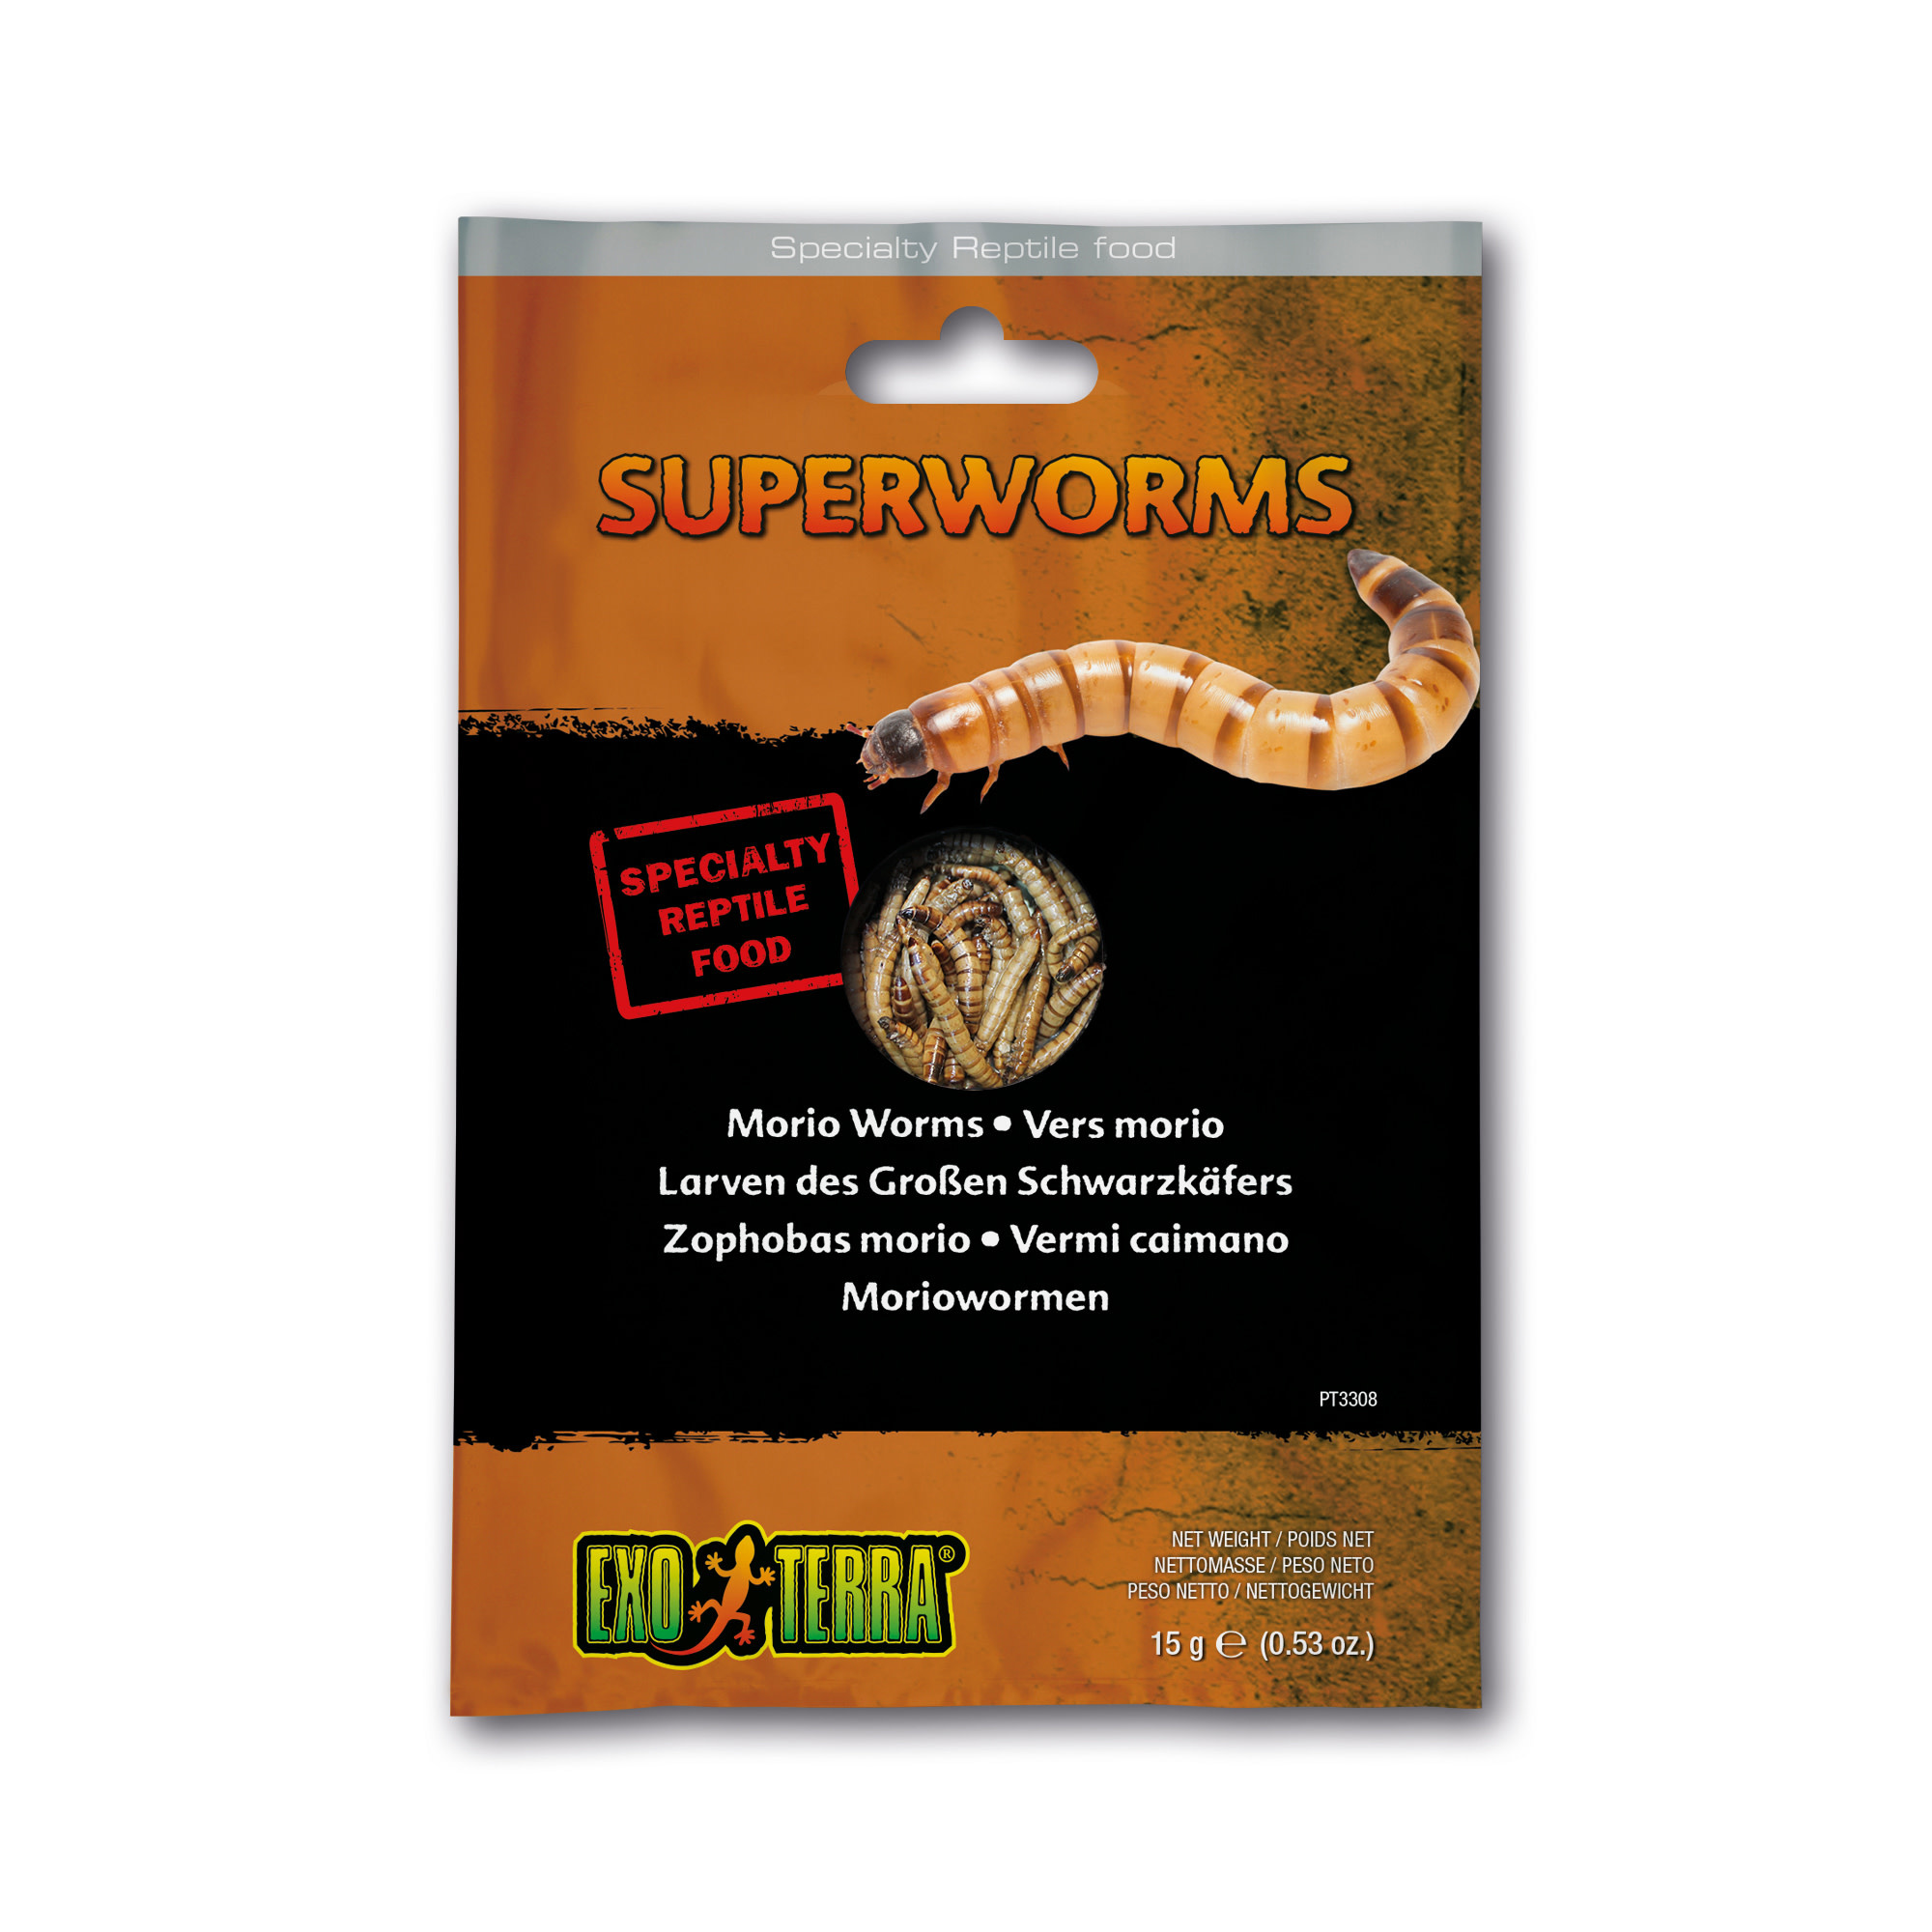 EX Reptile Food, Superworms ,15g-1